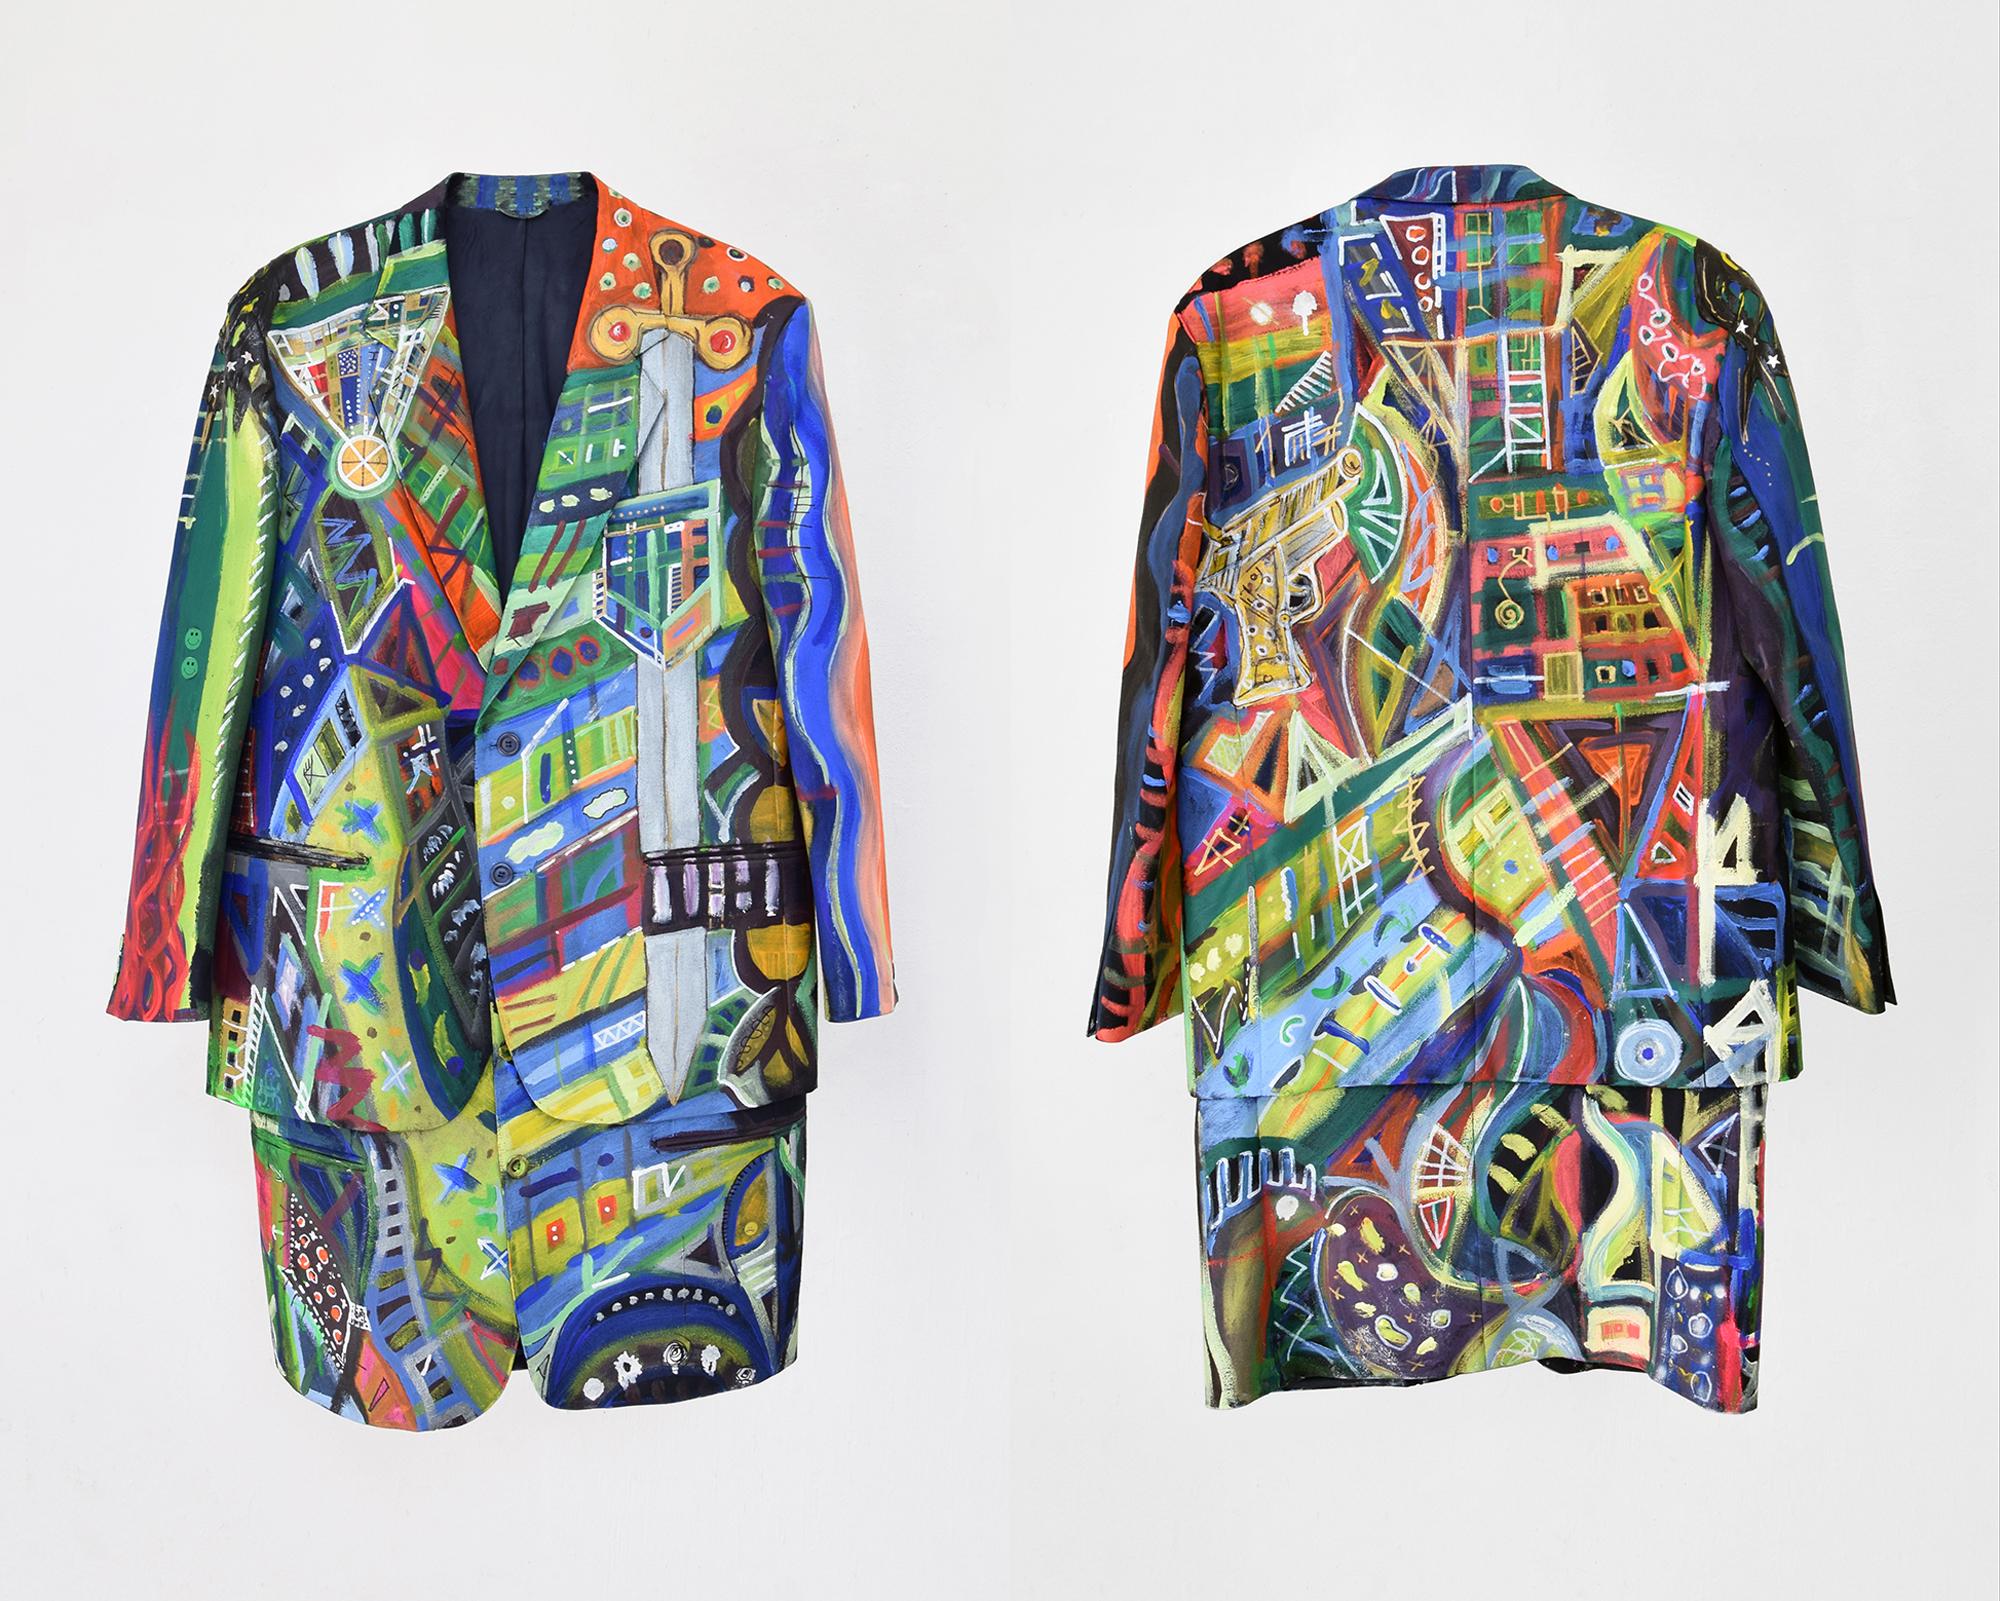 Vestito di Luce (spada) Luca Bosani 2017 Painthing